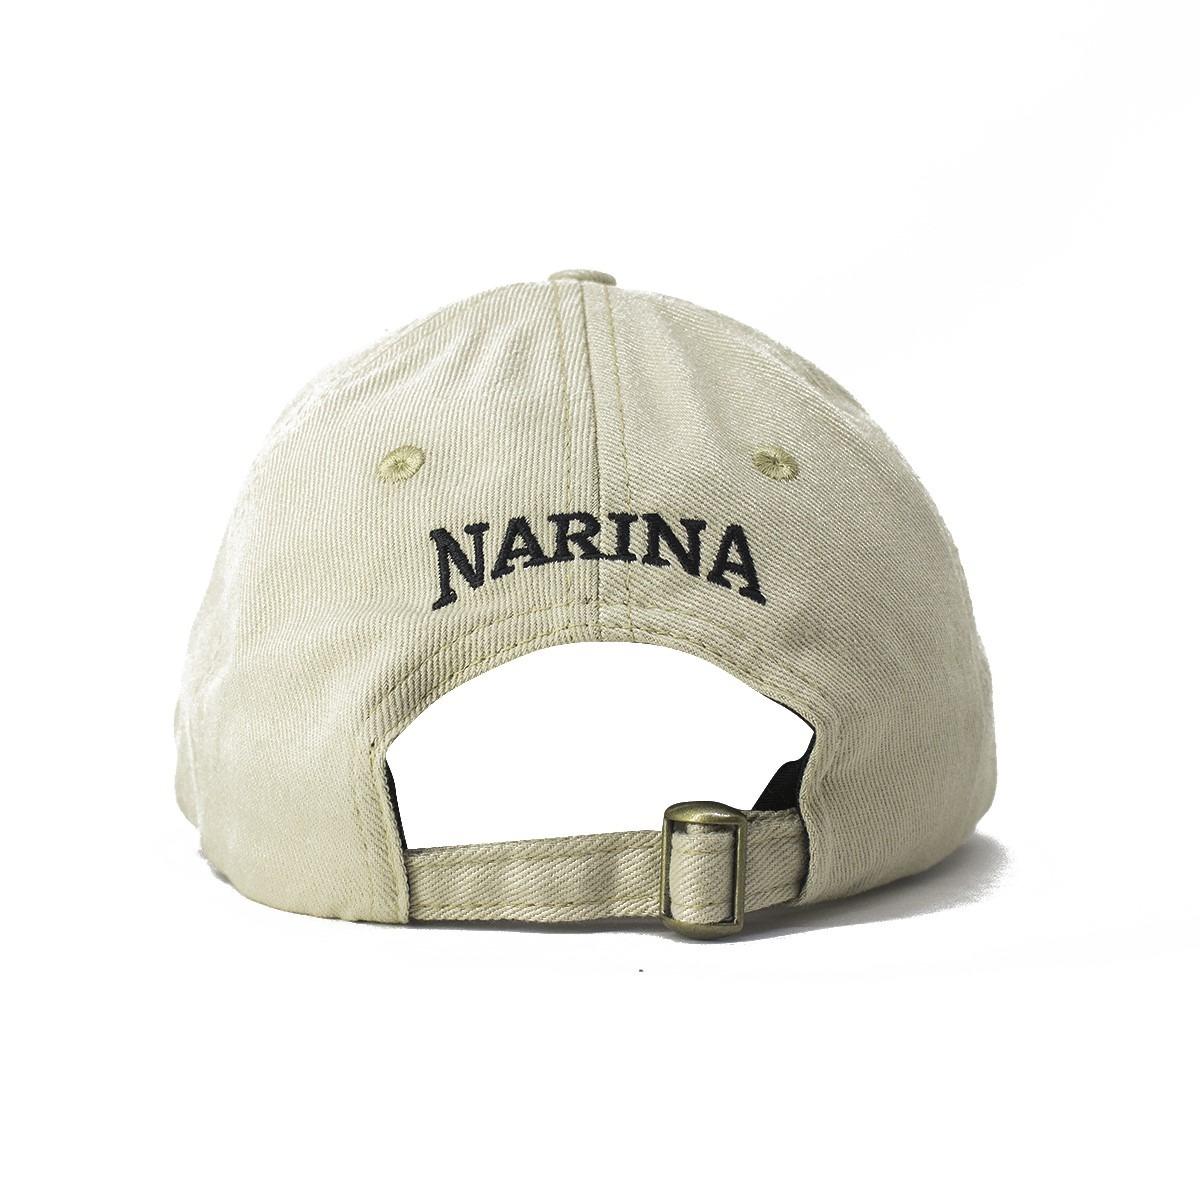 boné dad hat narina aba curva bege original. Carregando zoom. 0f78324470e